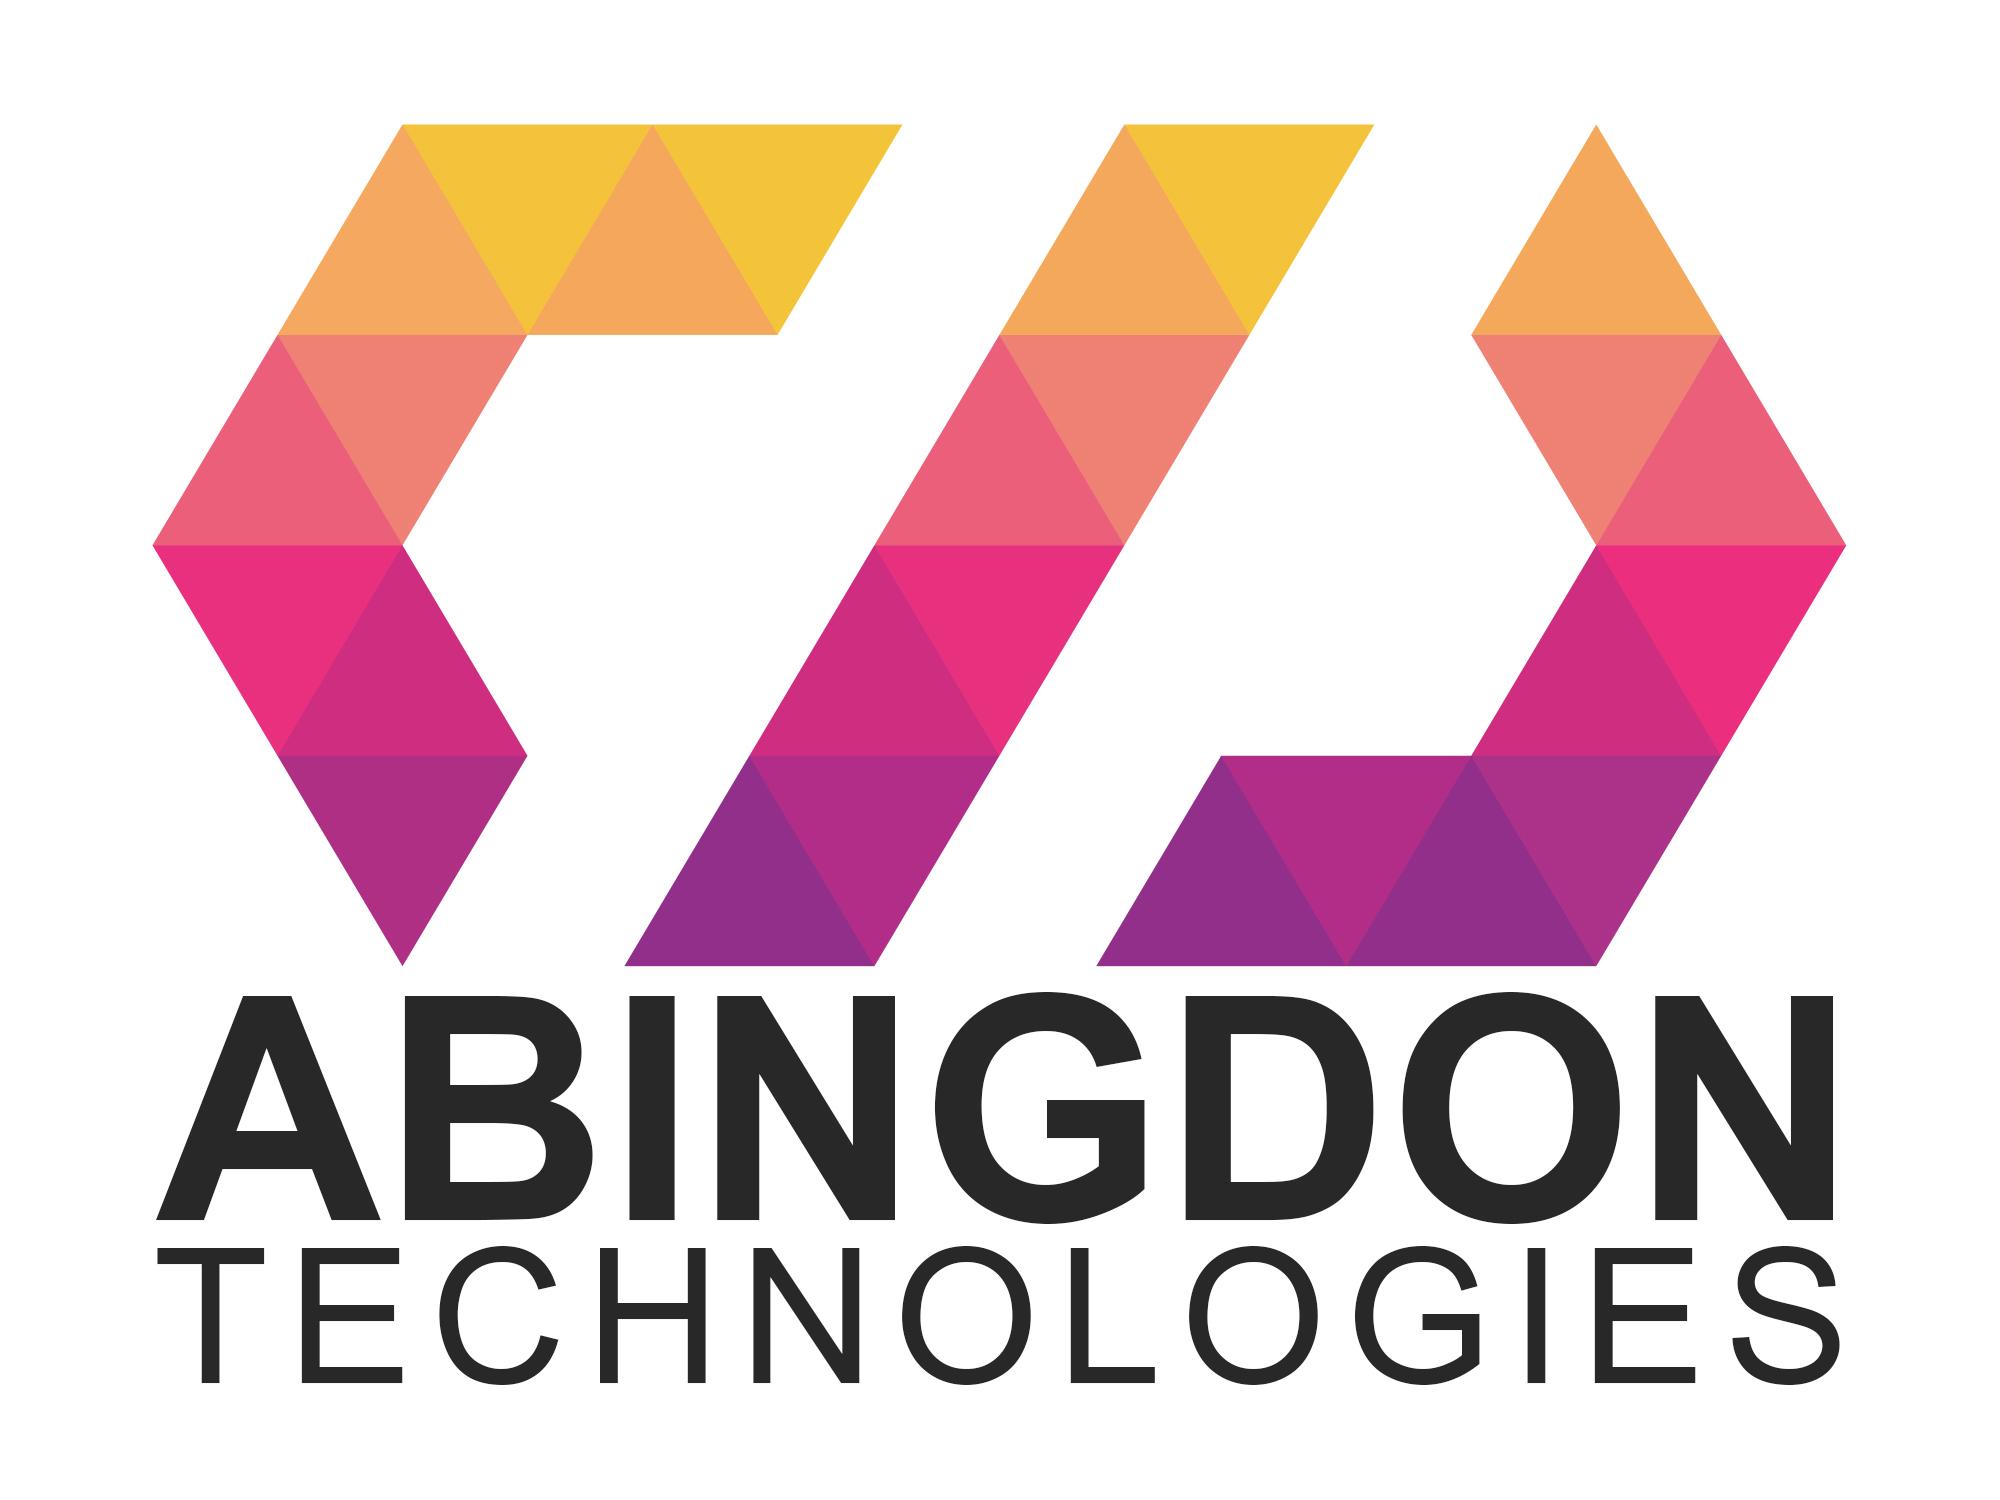 Abingdon Technologies